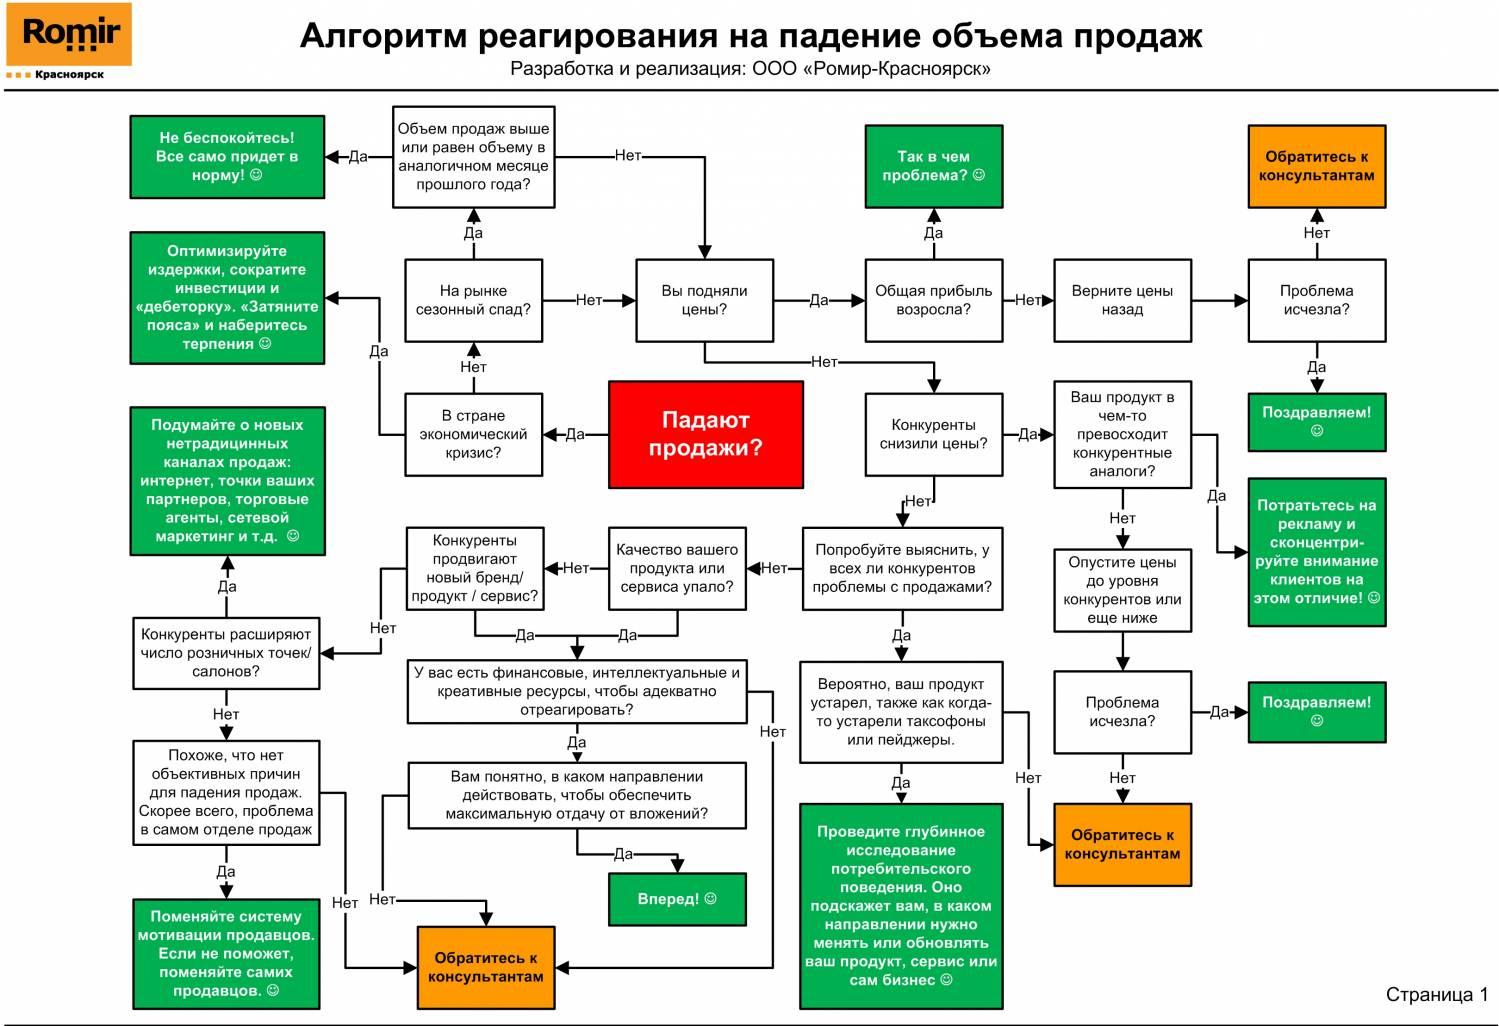 Схема реализации продукции пример